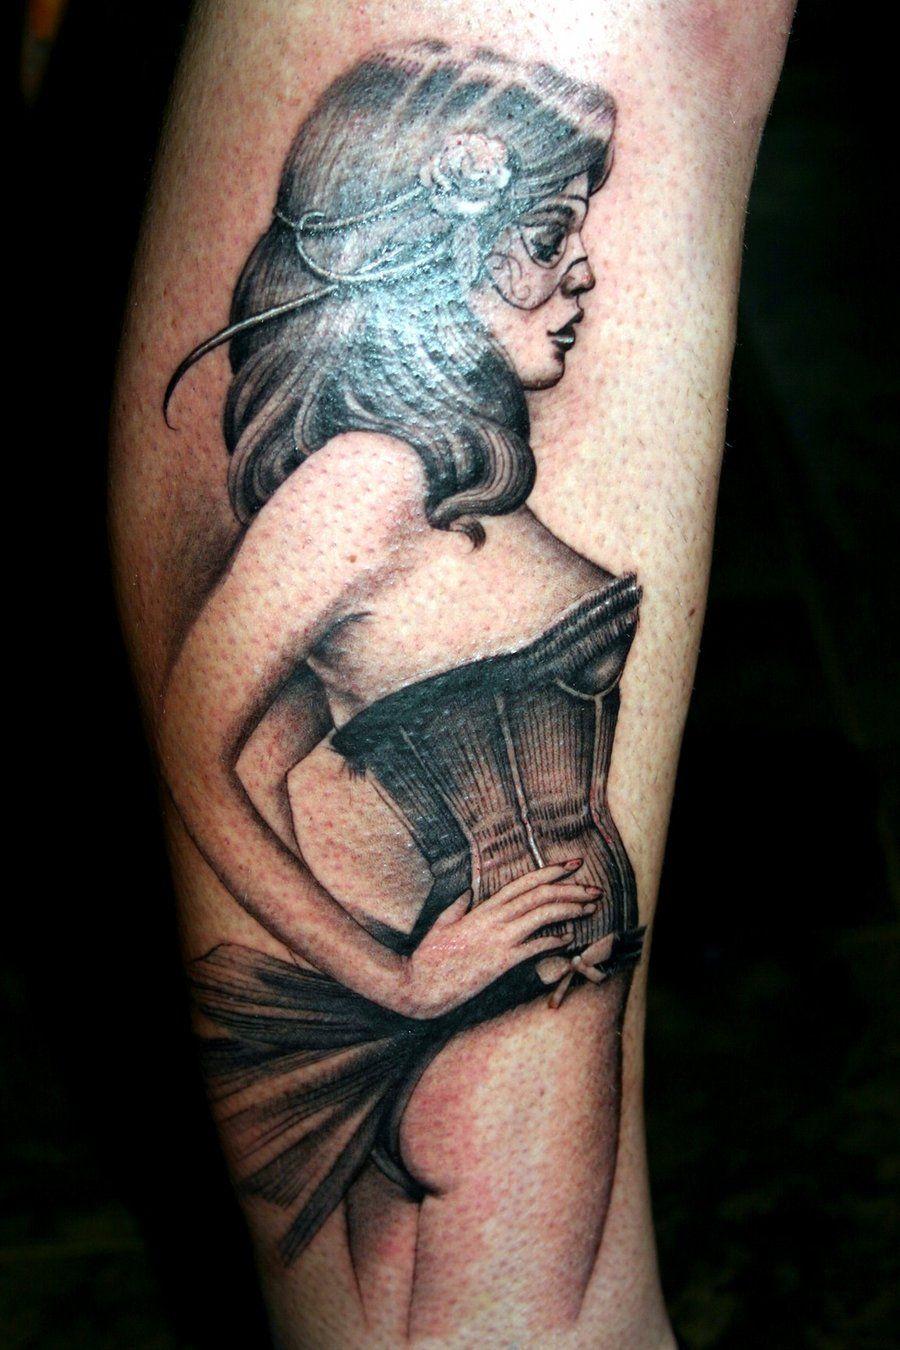 pin up girl tattoos - HD900×1350